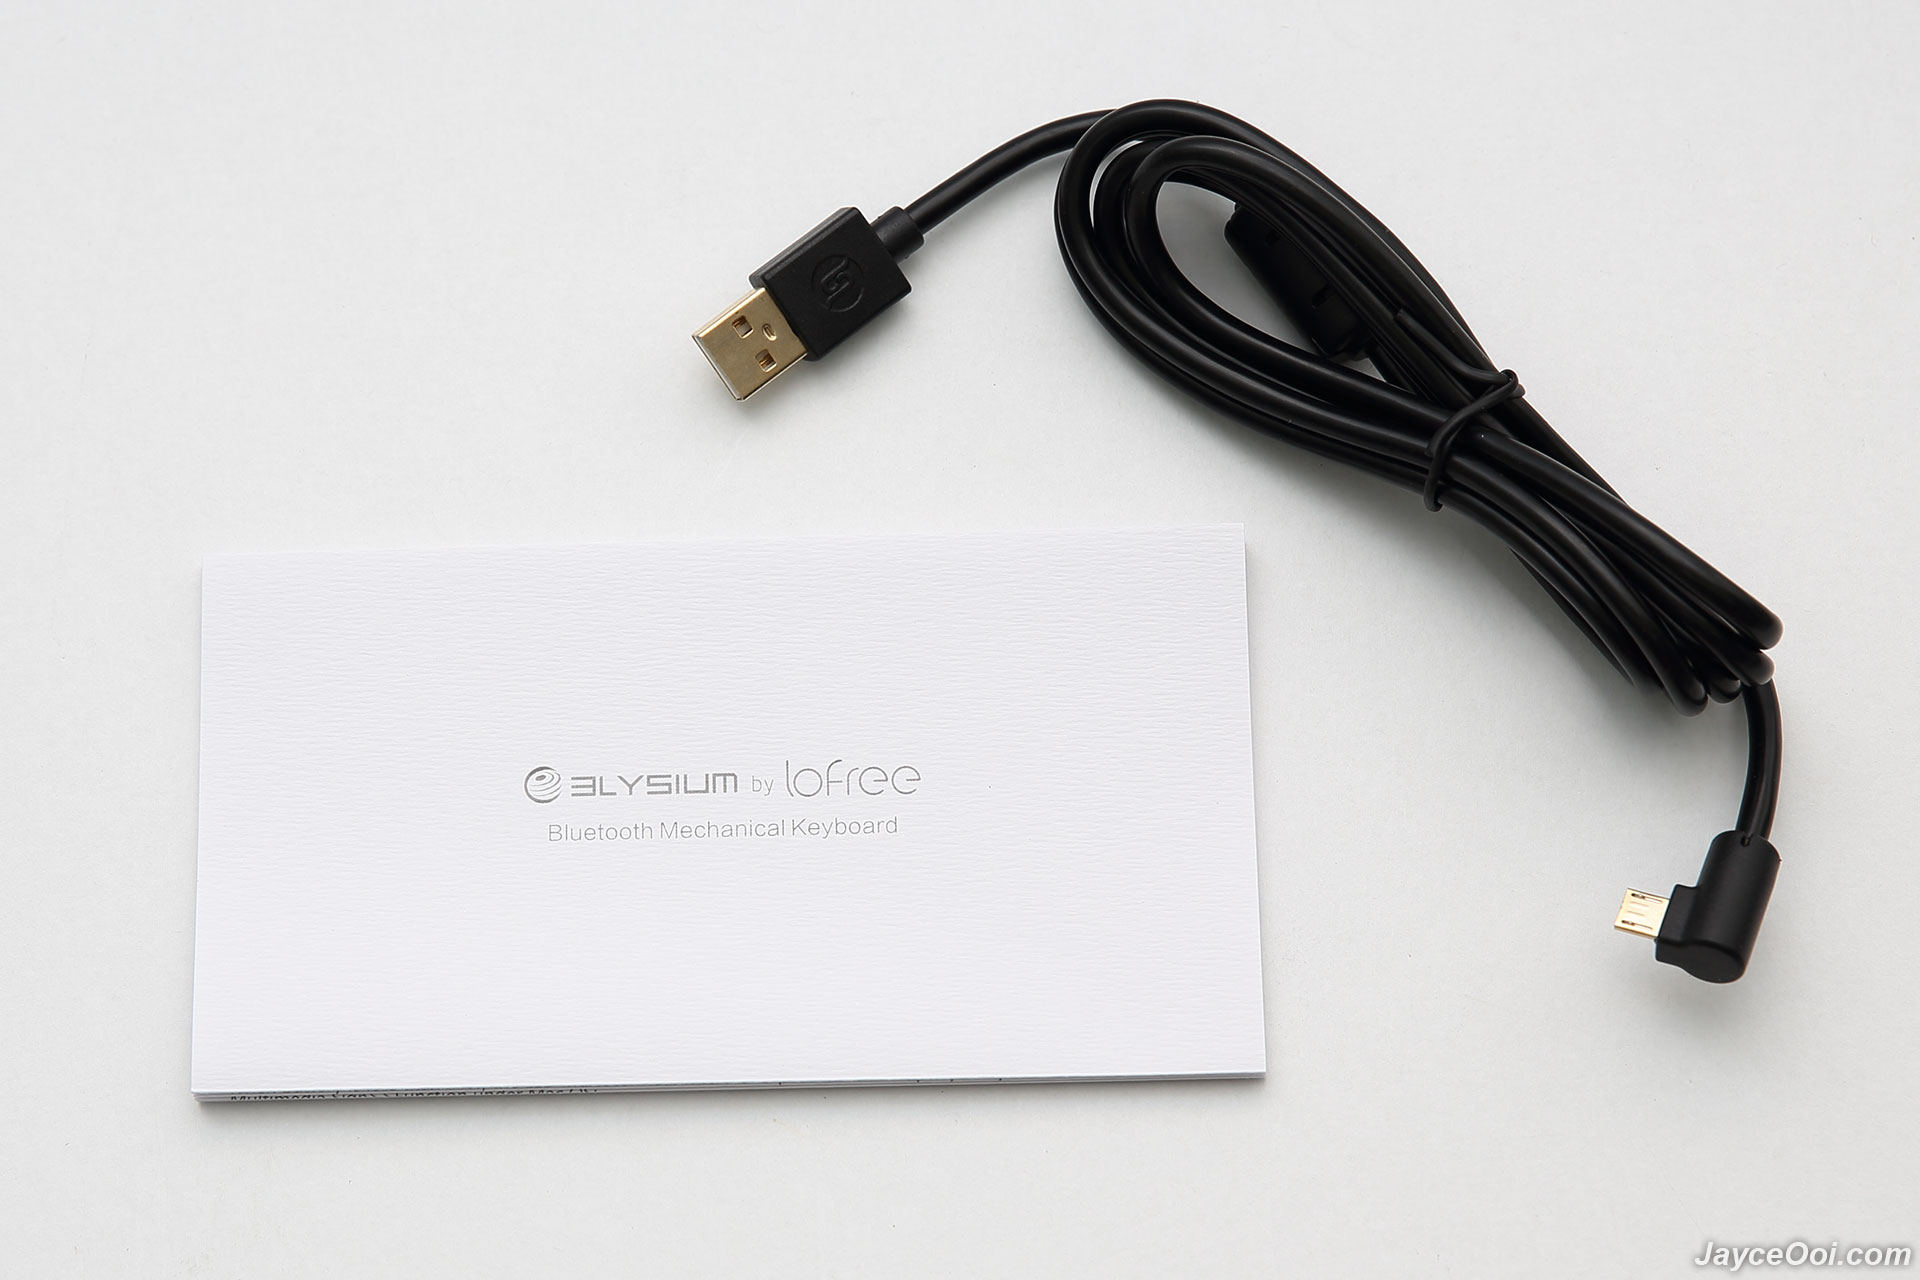 Elysium DOT Review - JayceOoi.com